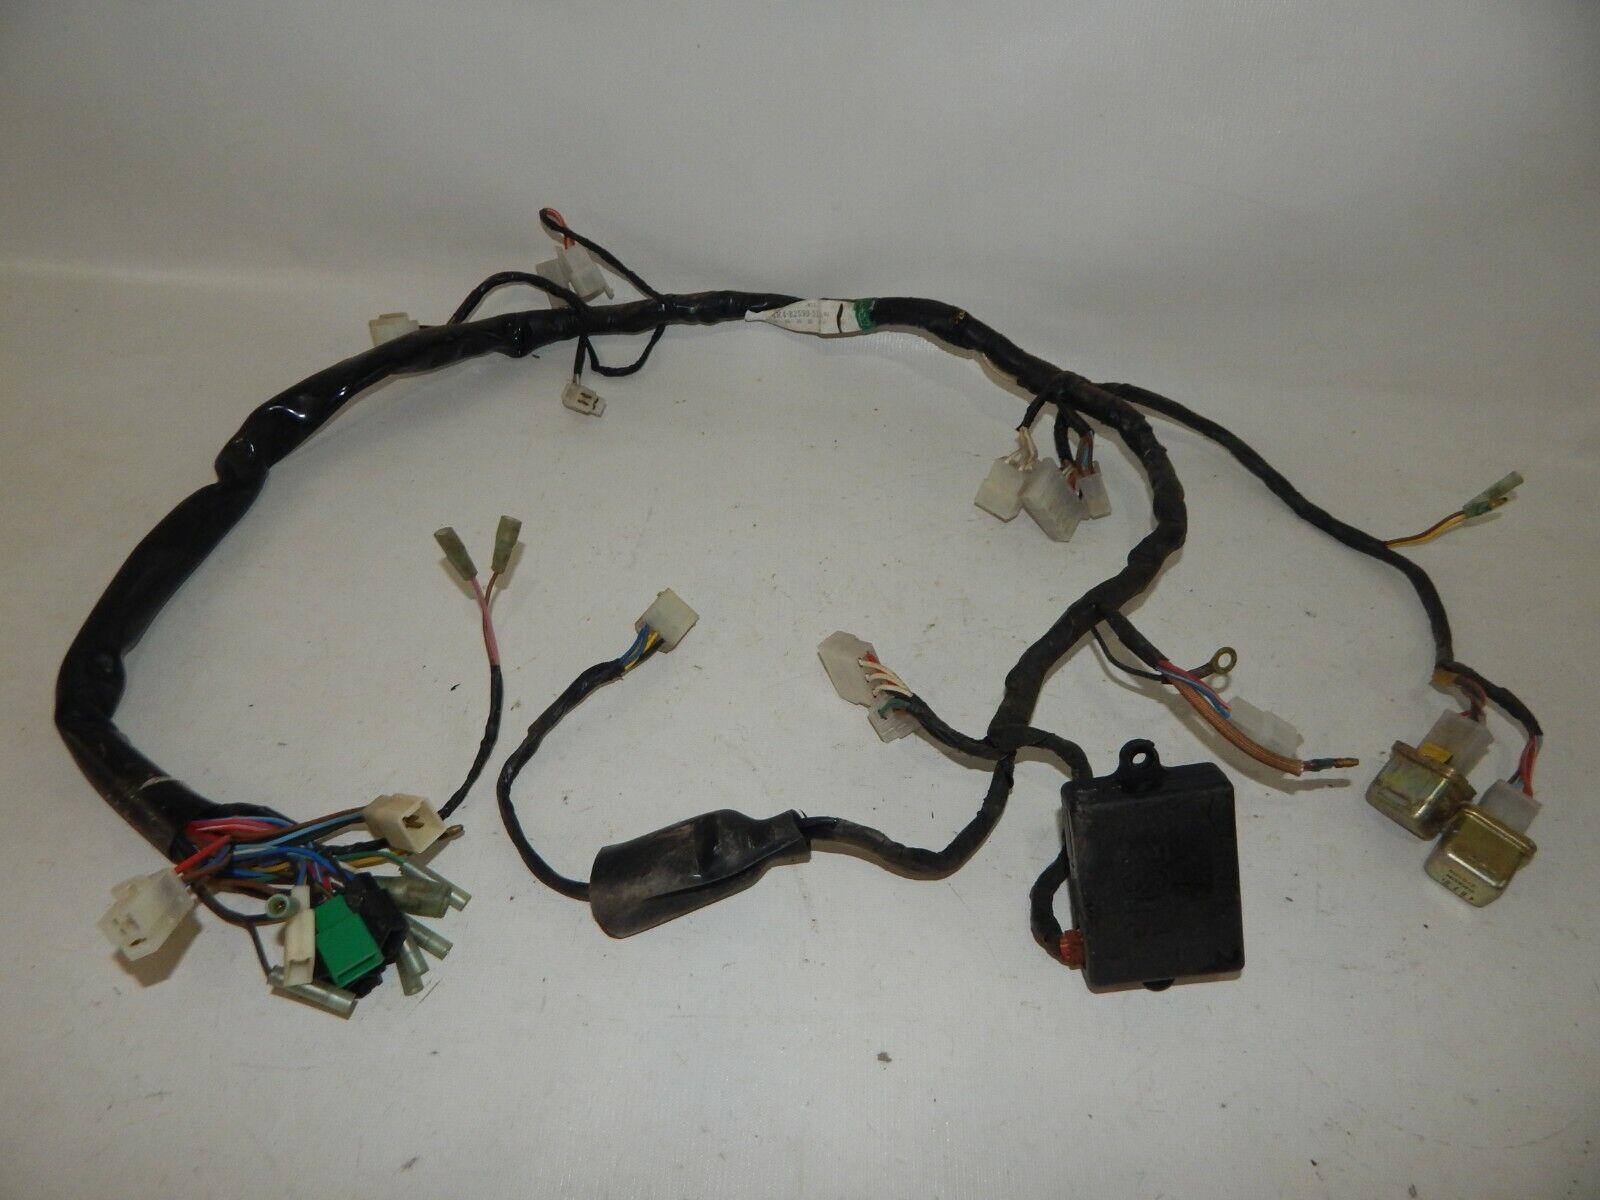 NOS OEM 1981-1982 Yamaha XS400 Wiring Harness Main Body Engine Loom  4R4-82590-51 | eBayeBay